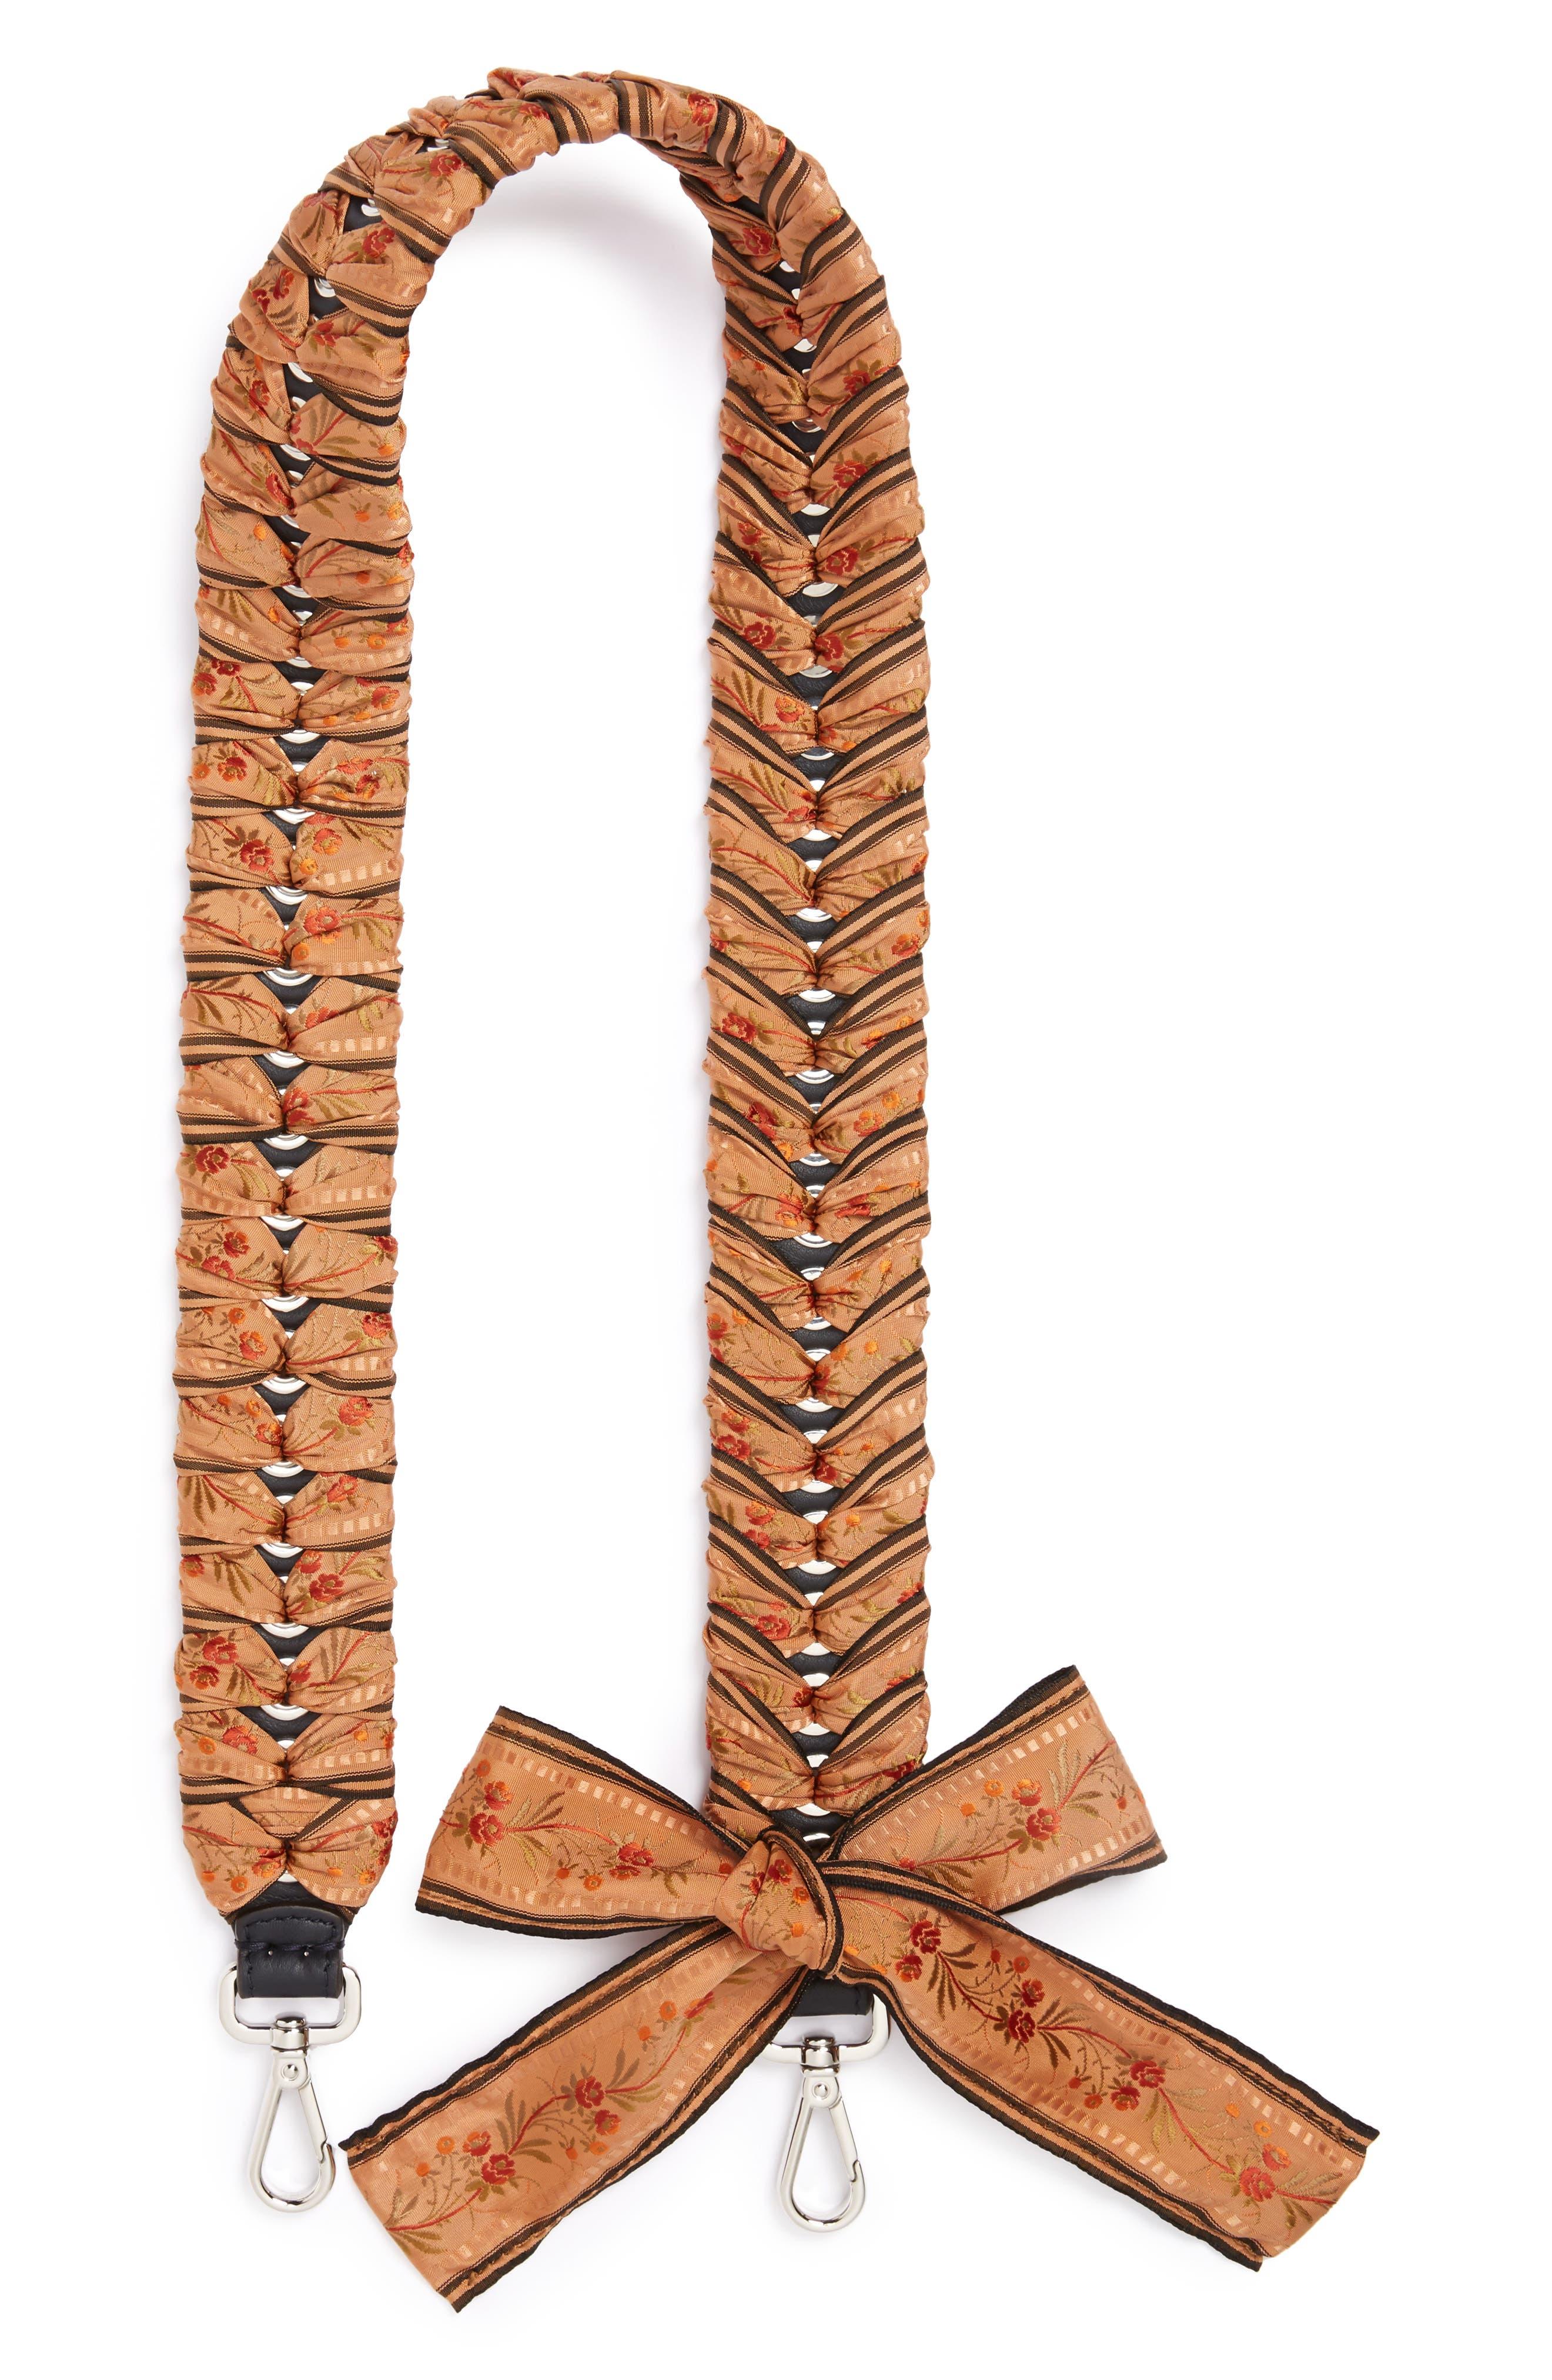 Floral Ribbon Guitar Bag Strap,                             Main thumbnail 1, color,                             White Multi